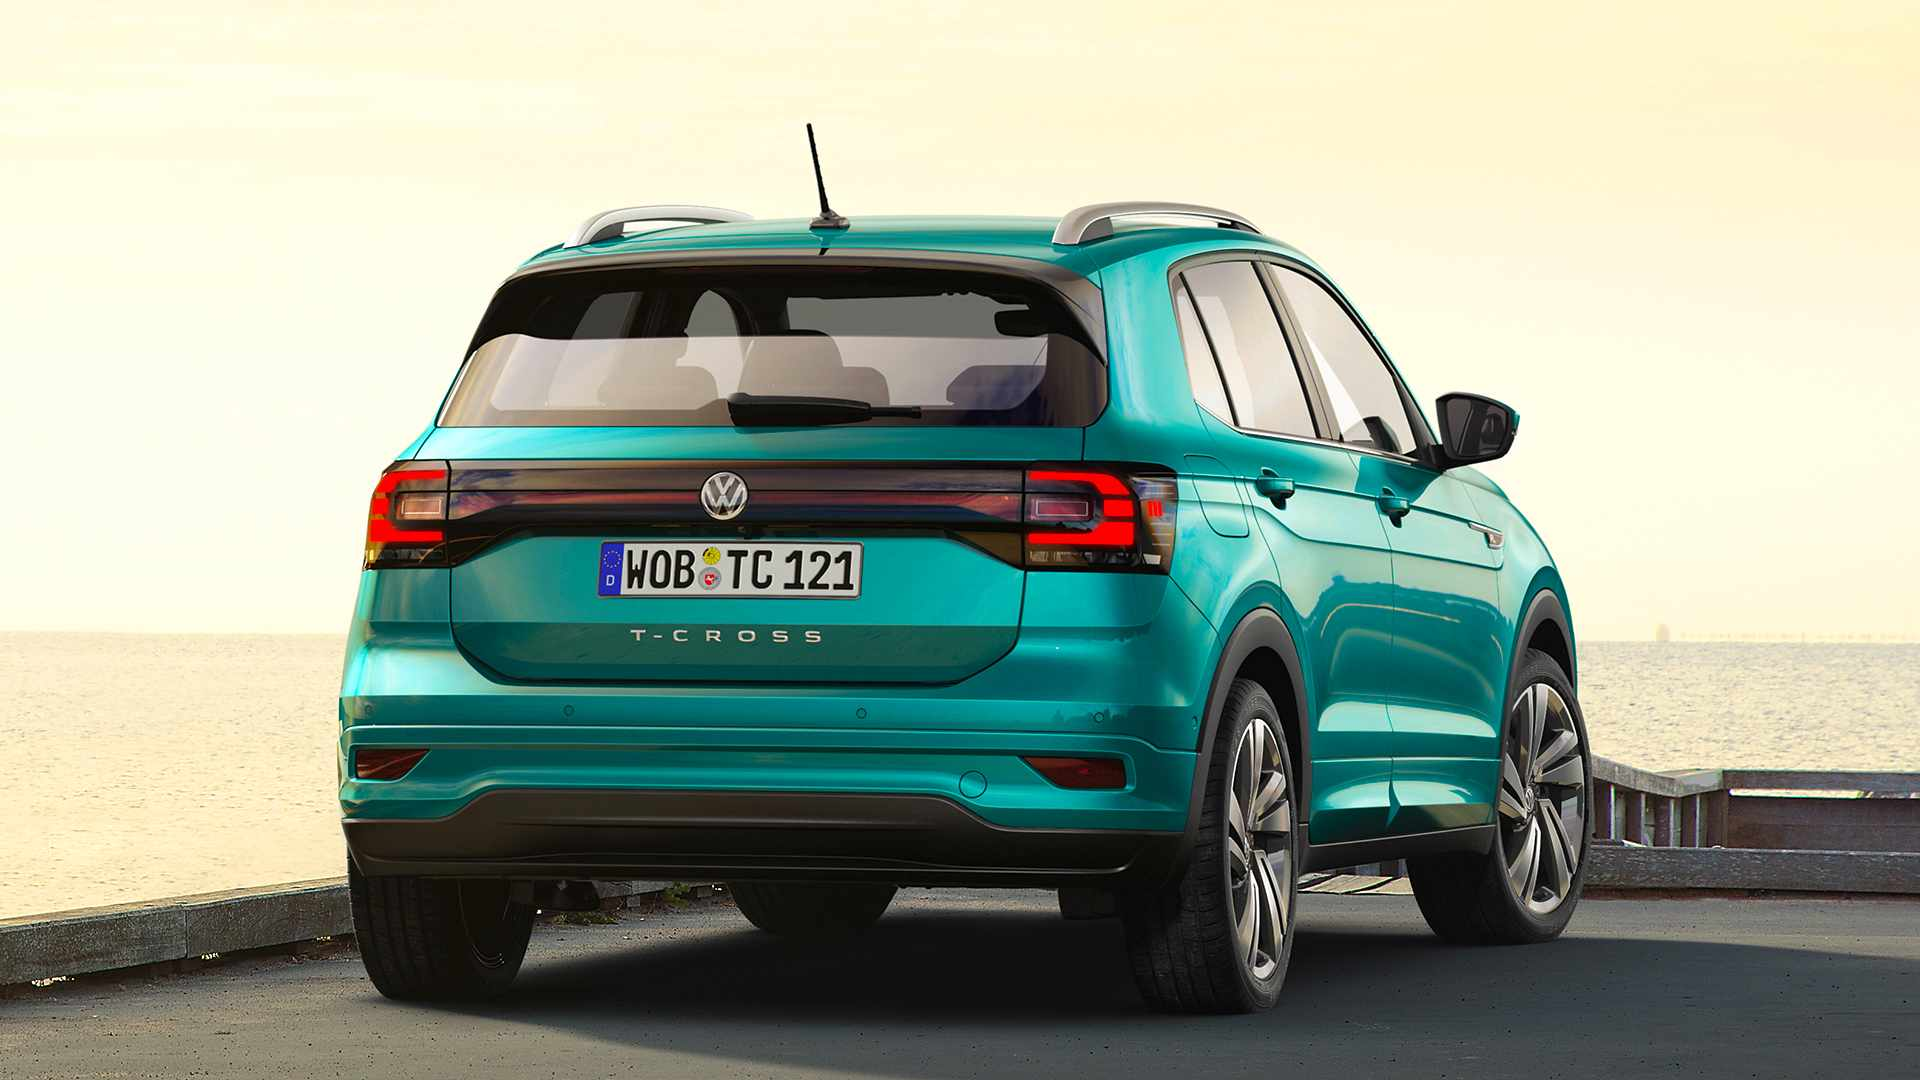 2019 Volkswagen T-Cross Finally Goes Official - autoevolution